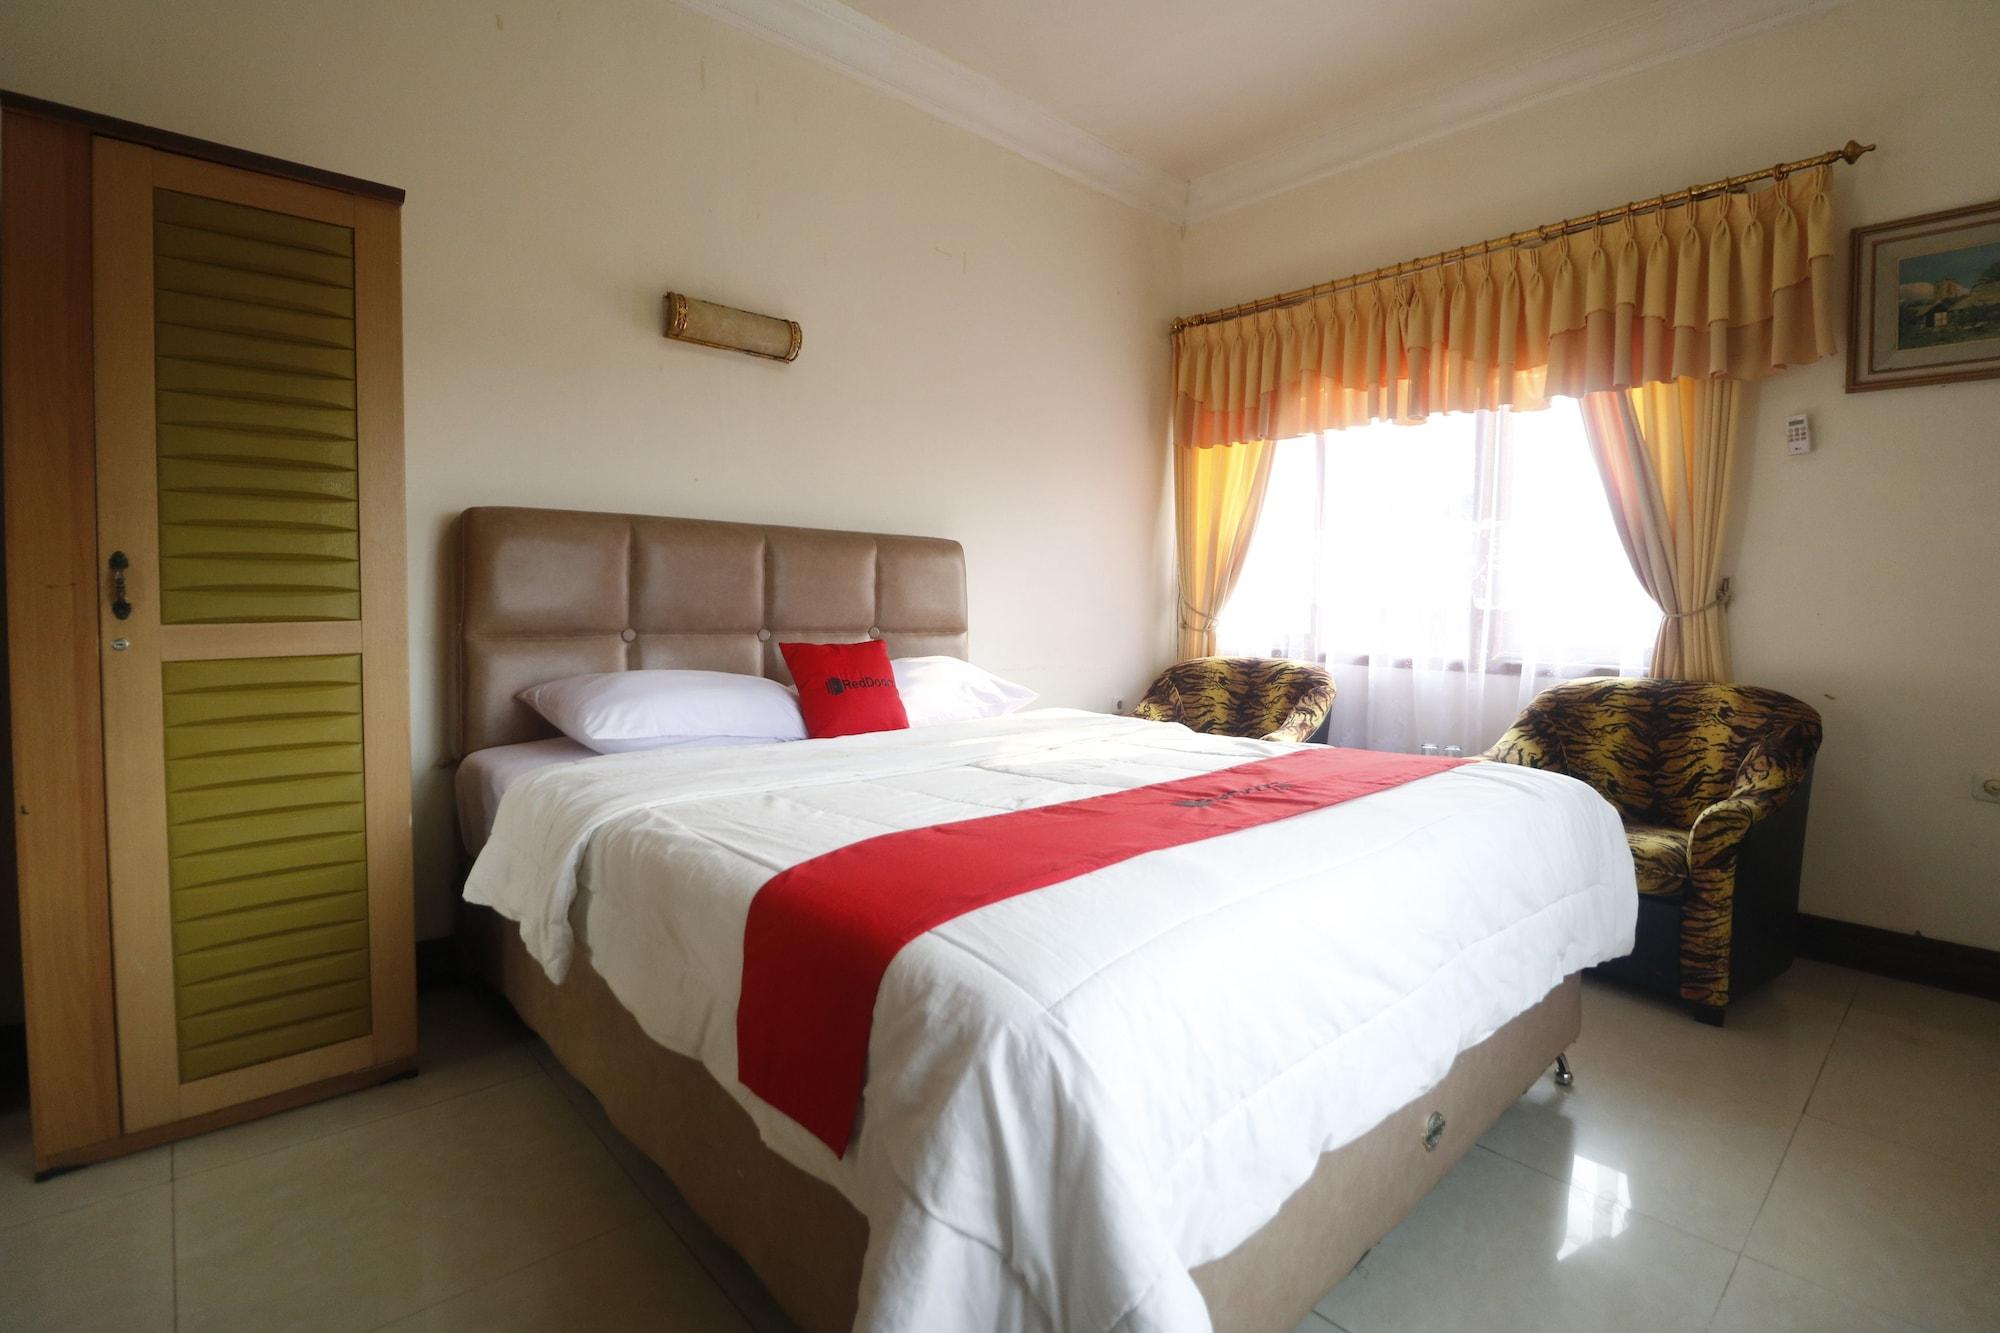 RedDoorz @ Cibogo Puncak Bogor, Bogor